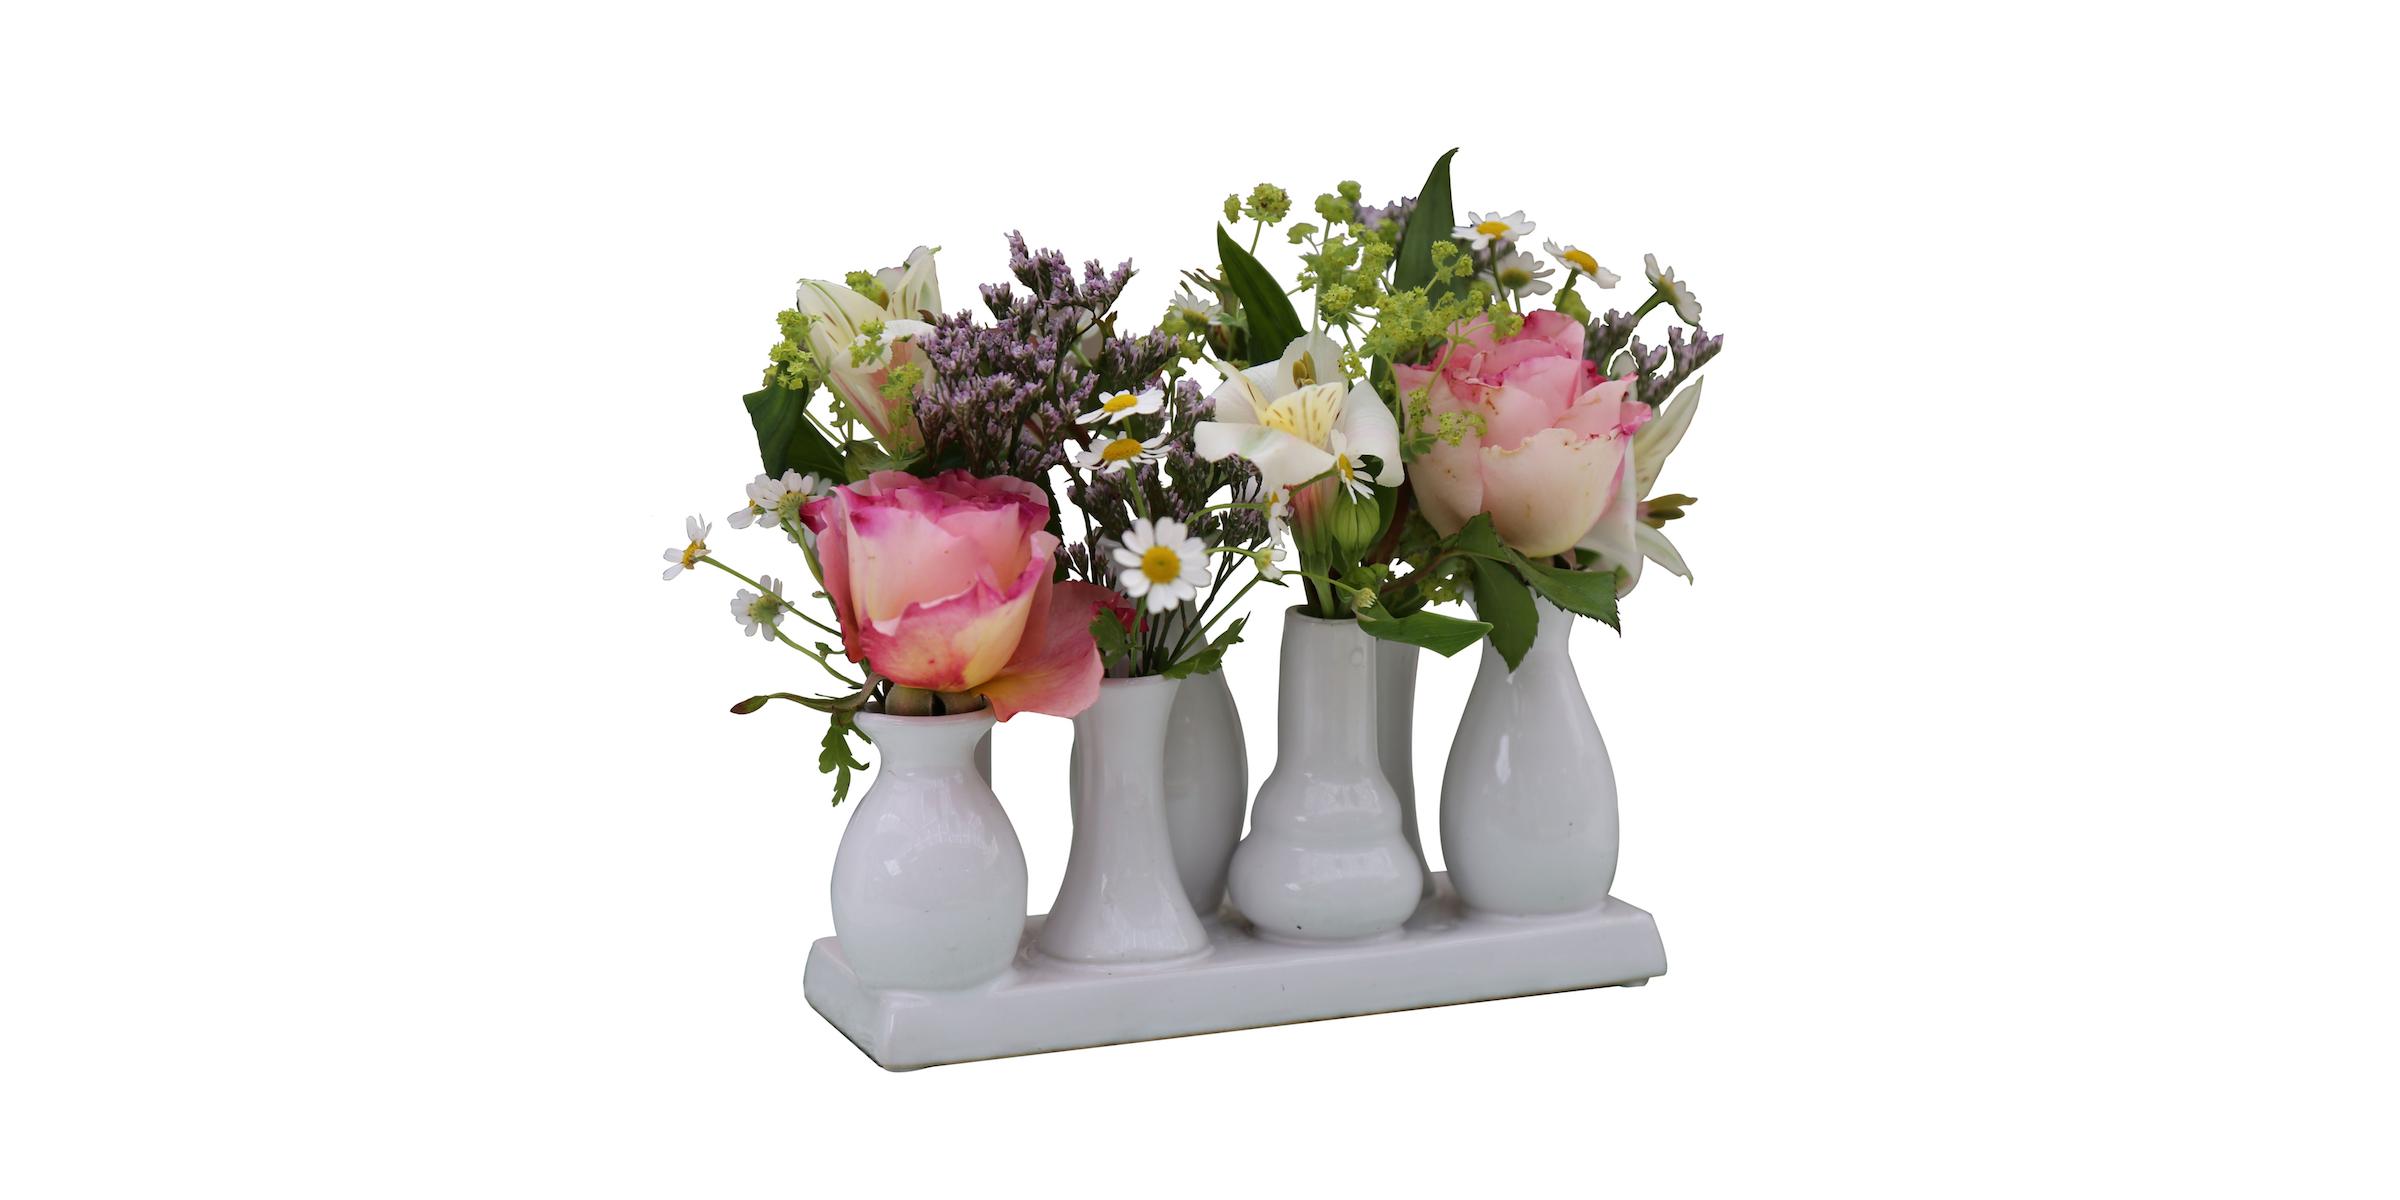 Keramikvasenset Blumenvase Keramikvasen weiß